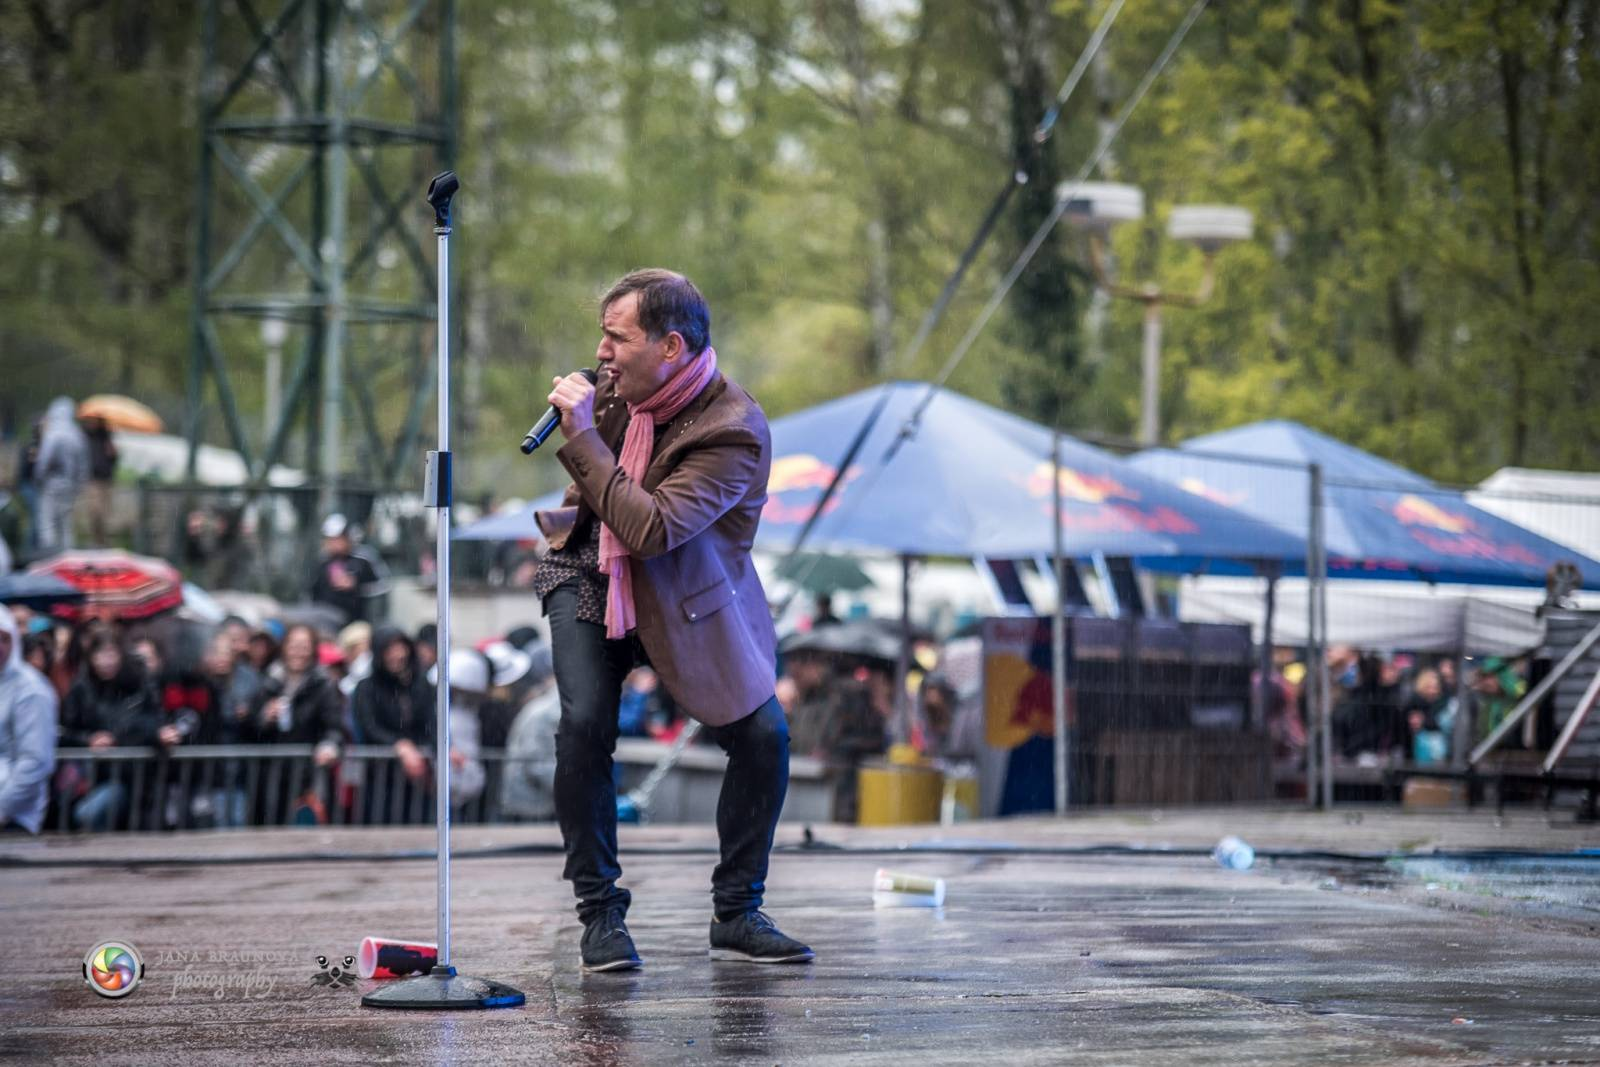 Plzeňský Majáles: TOP 6 momentů - Jiří Macháček tančil v dešti, Petr Lexa ze Slzy poslal mobil do publika